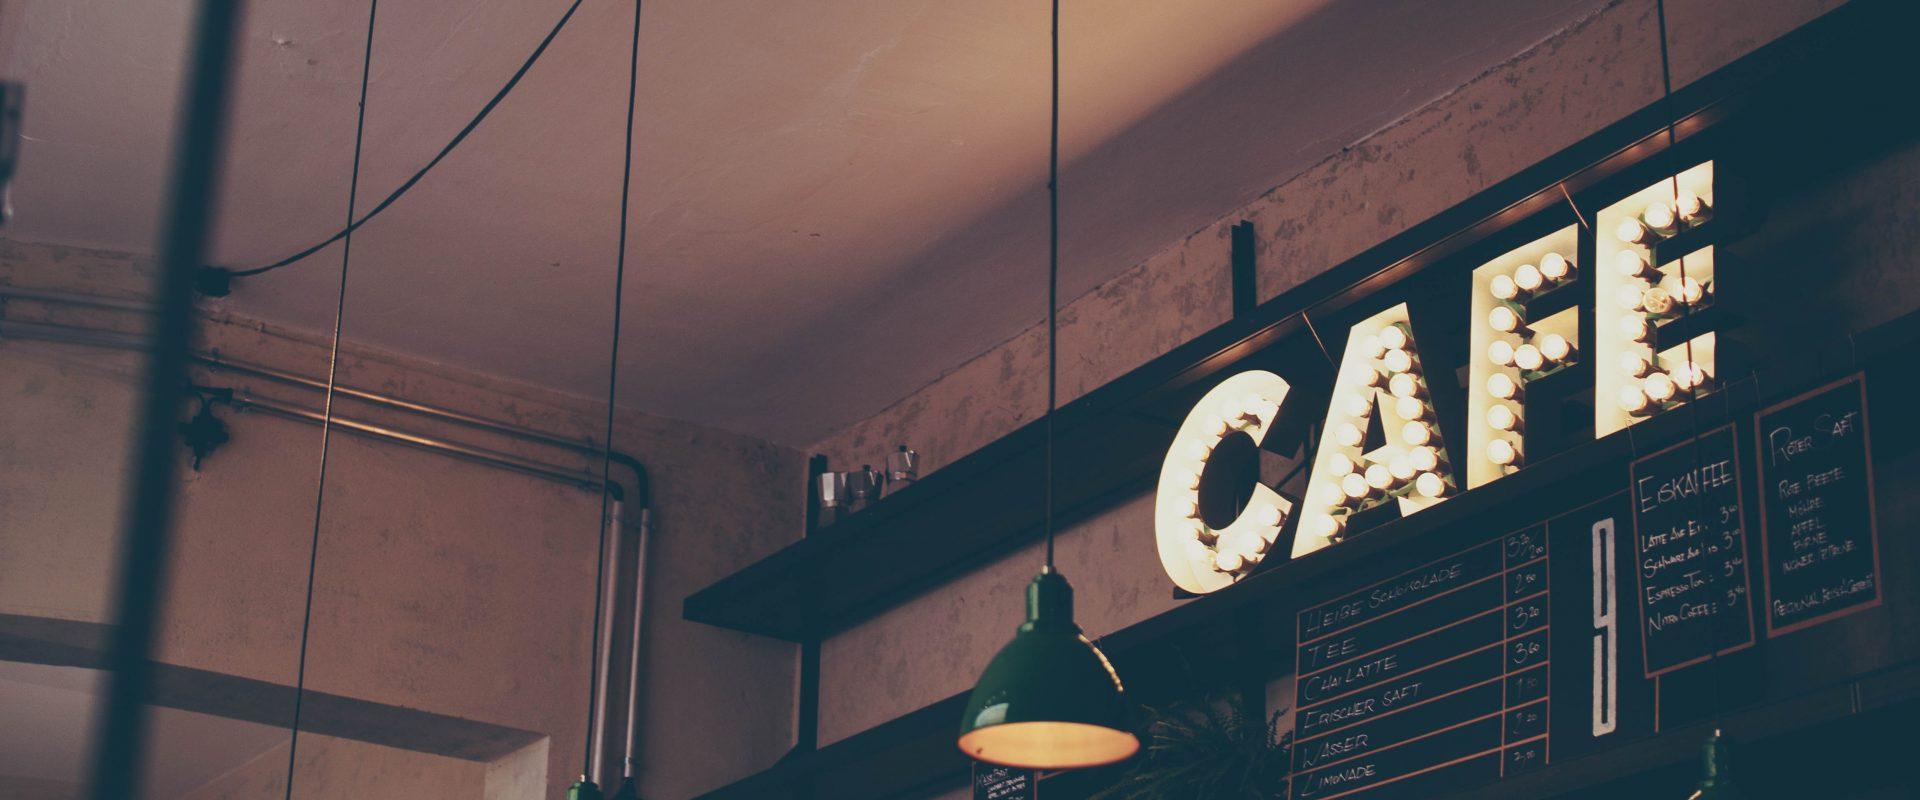 https://opensolution.se/wp-content/uploads/2018/06/cafe.jpg